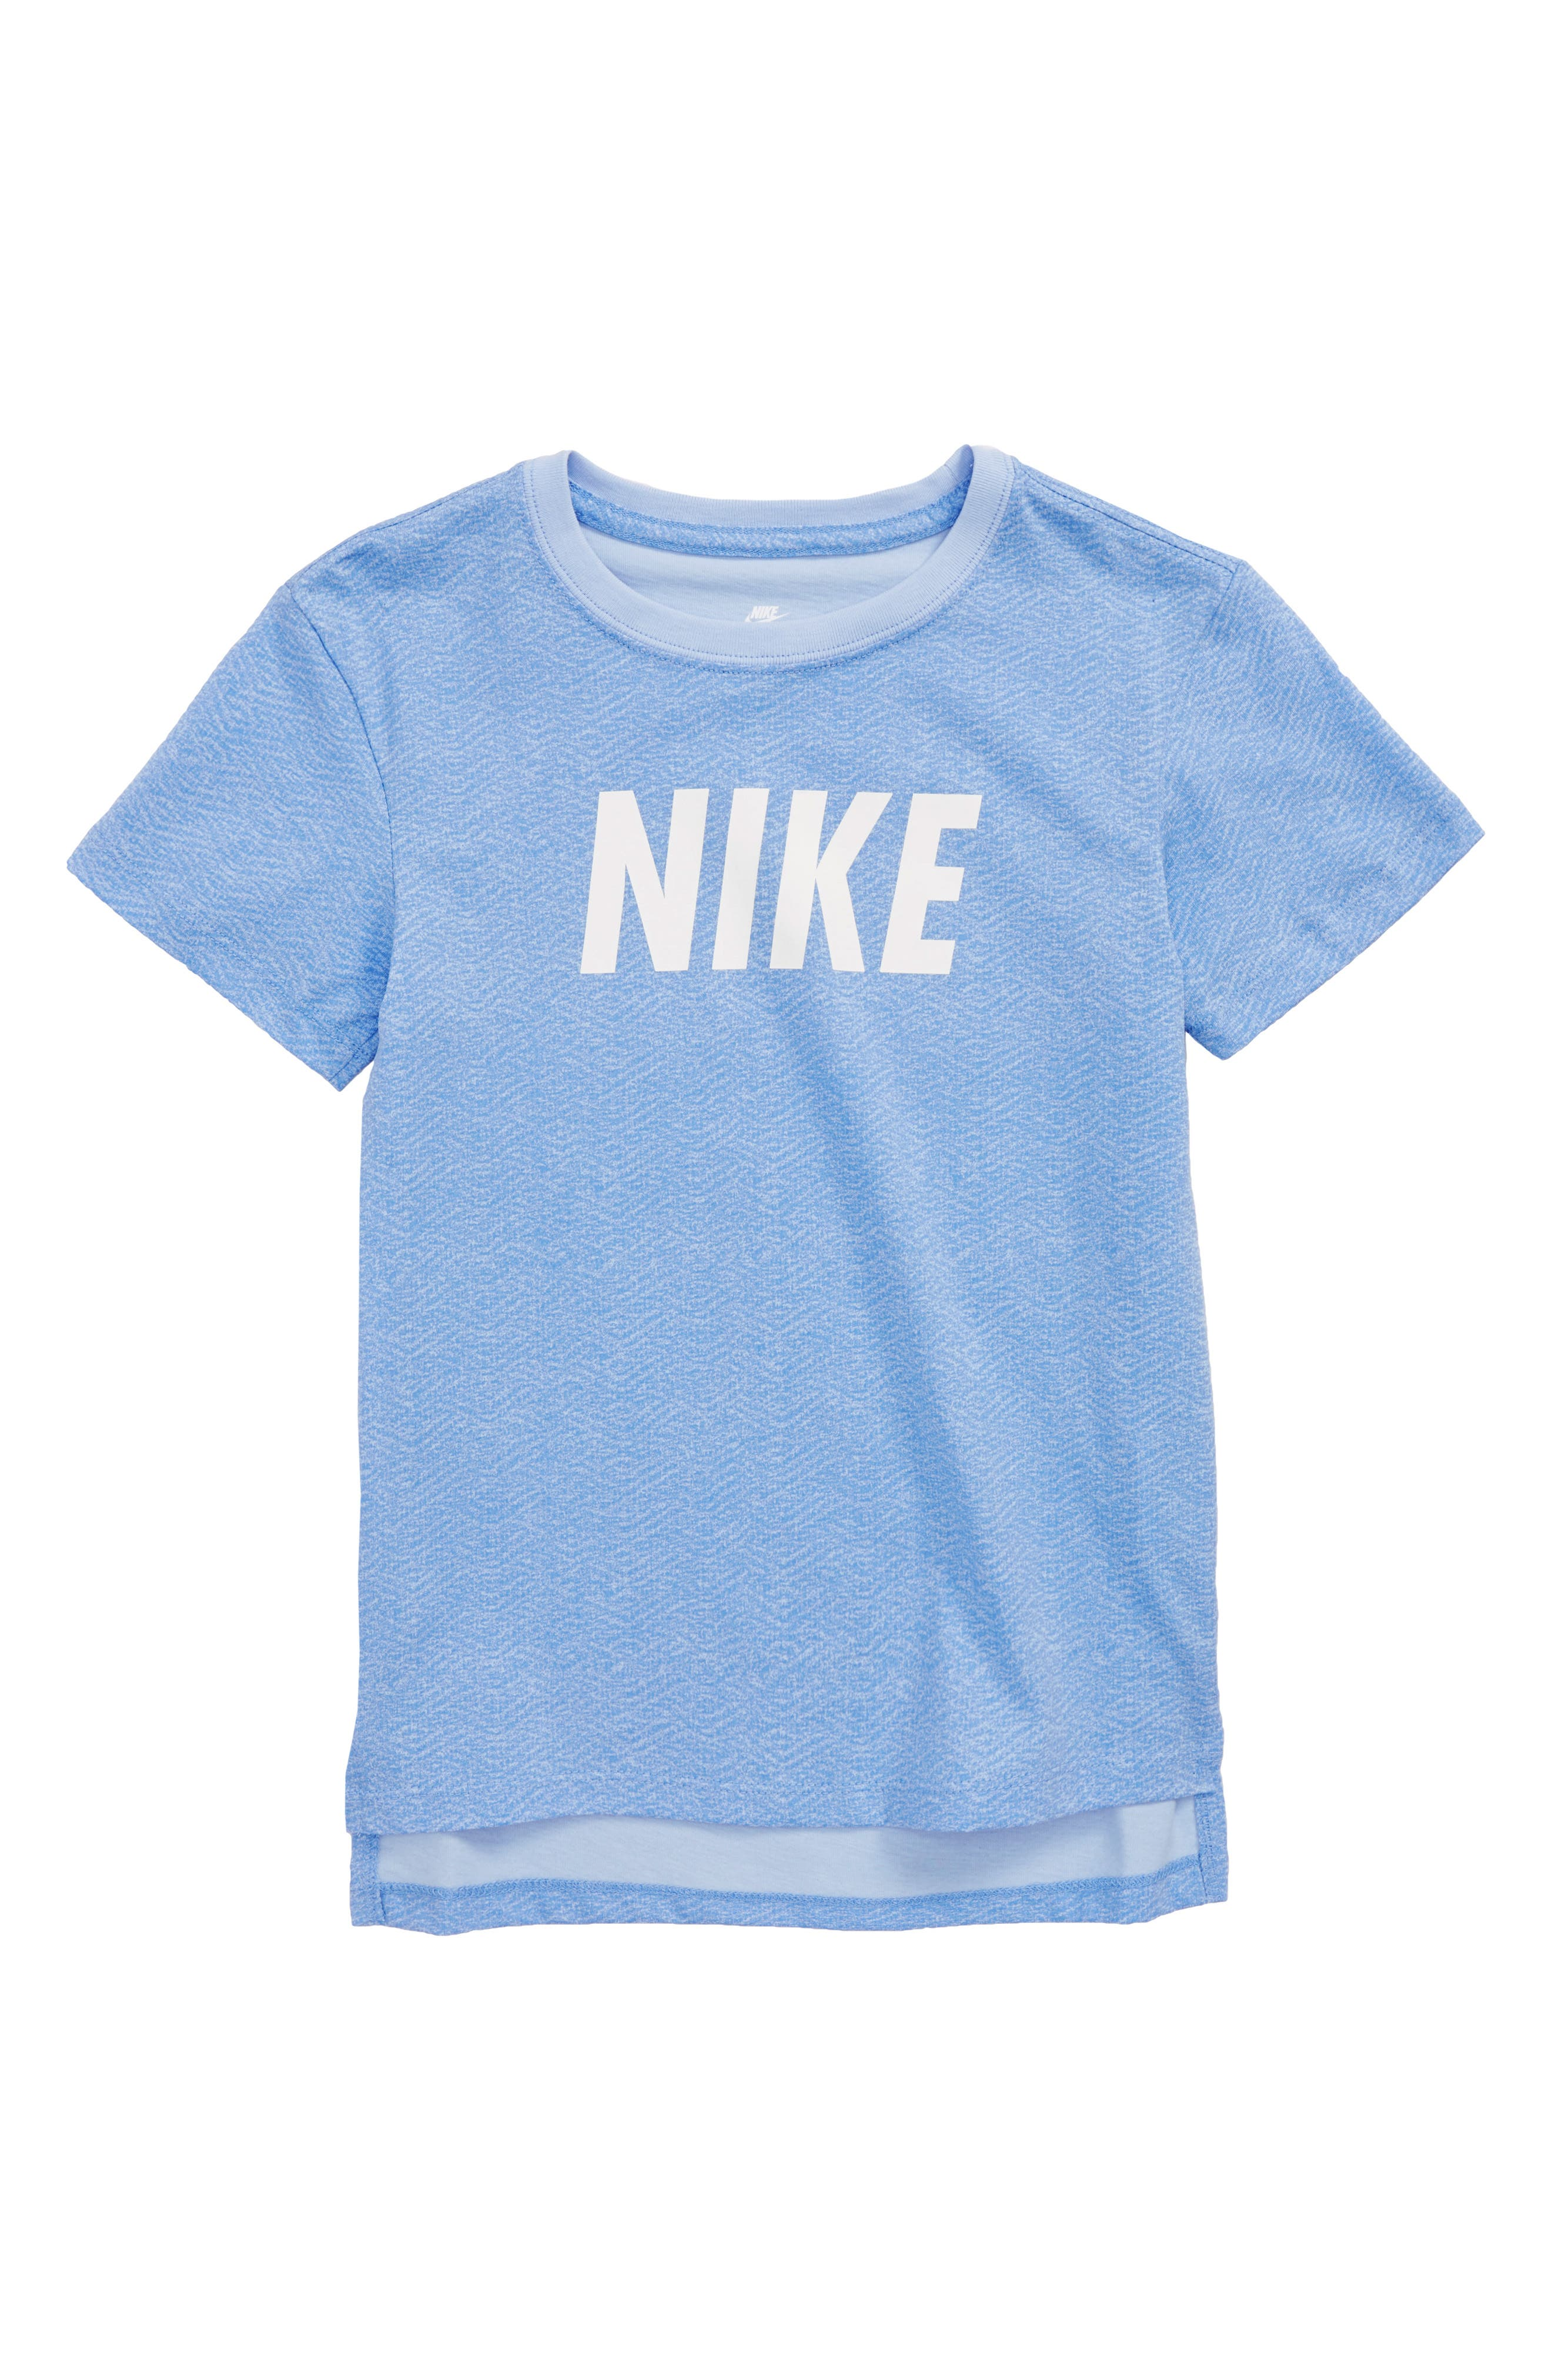 Sportswear Graphic Tee,                         Main,                         color, 415